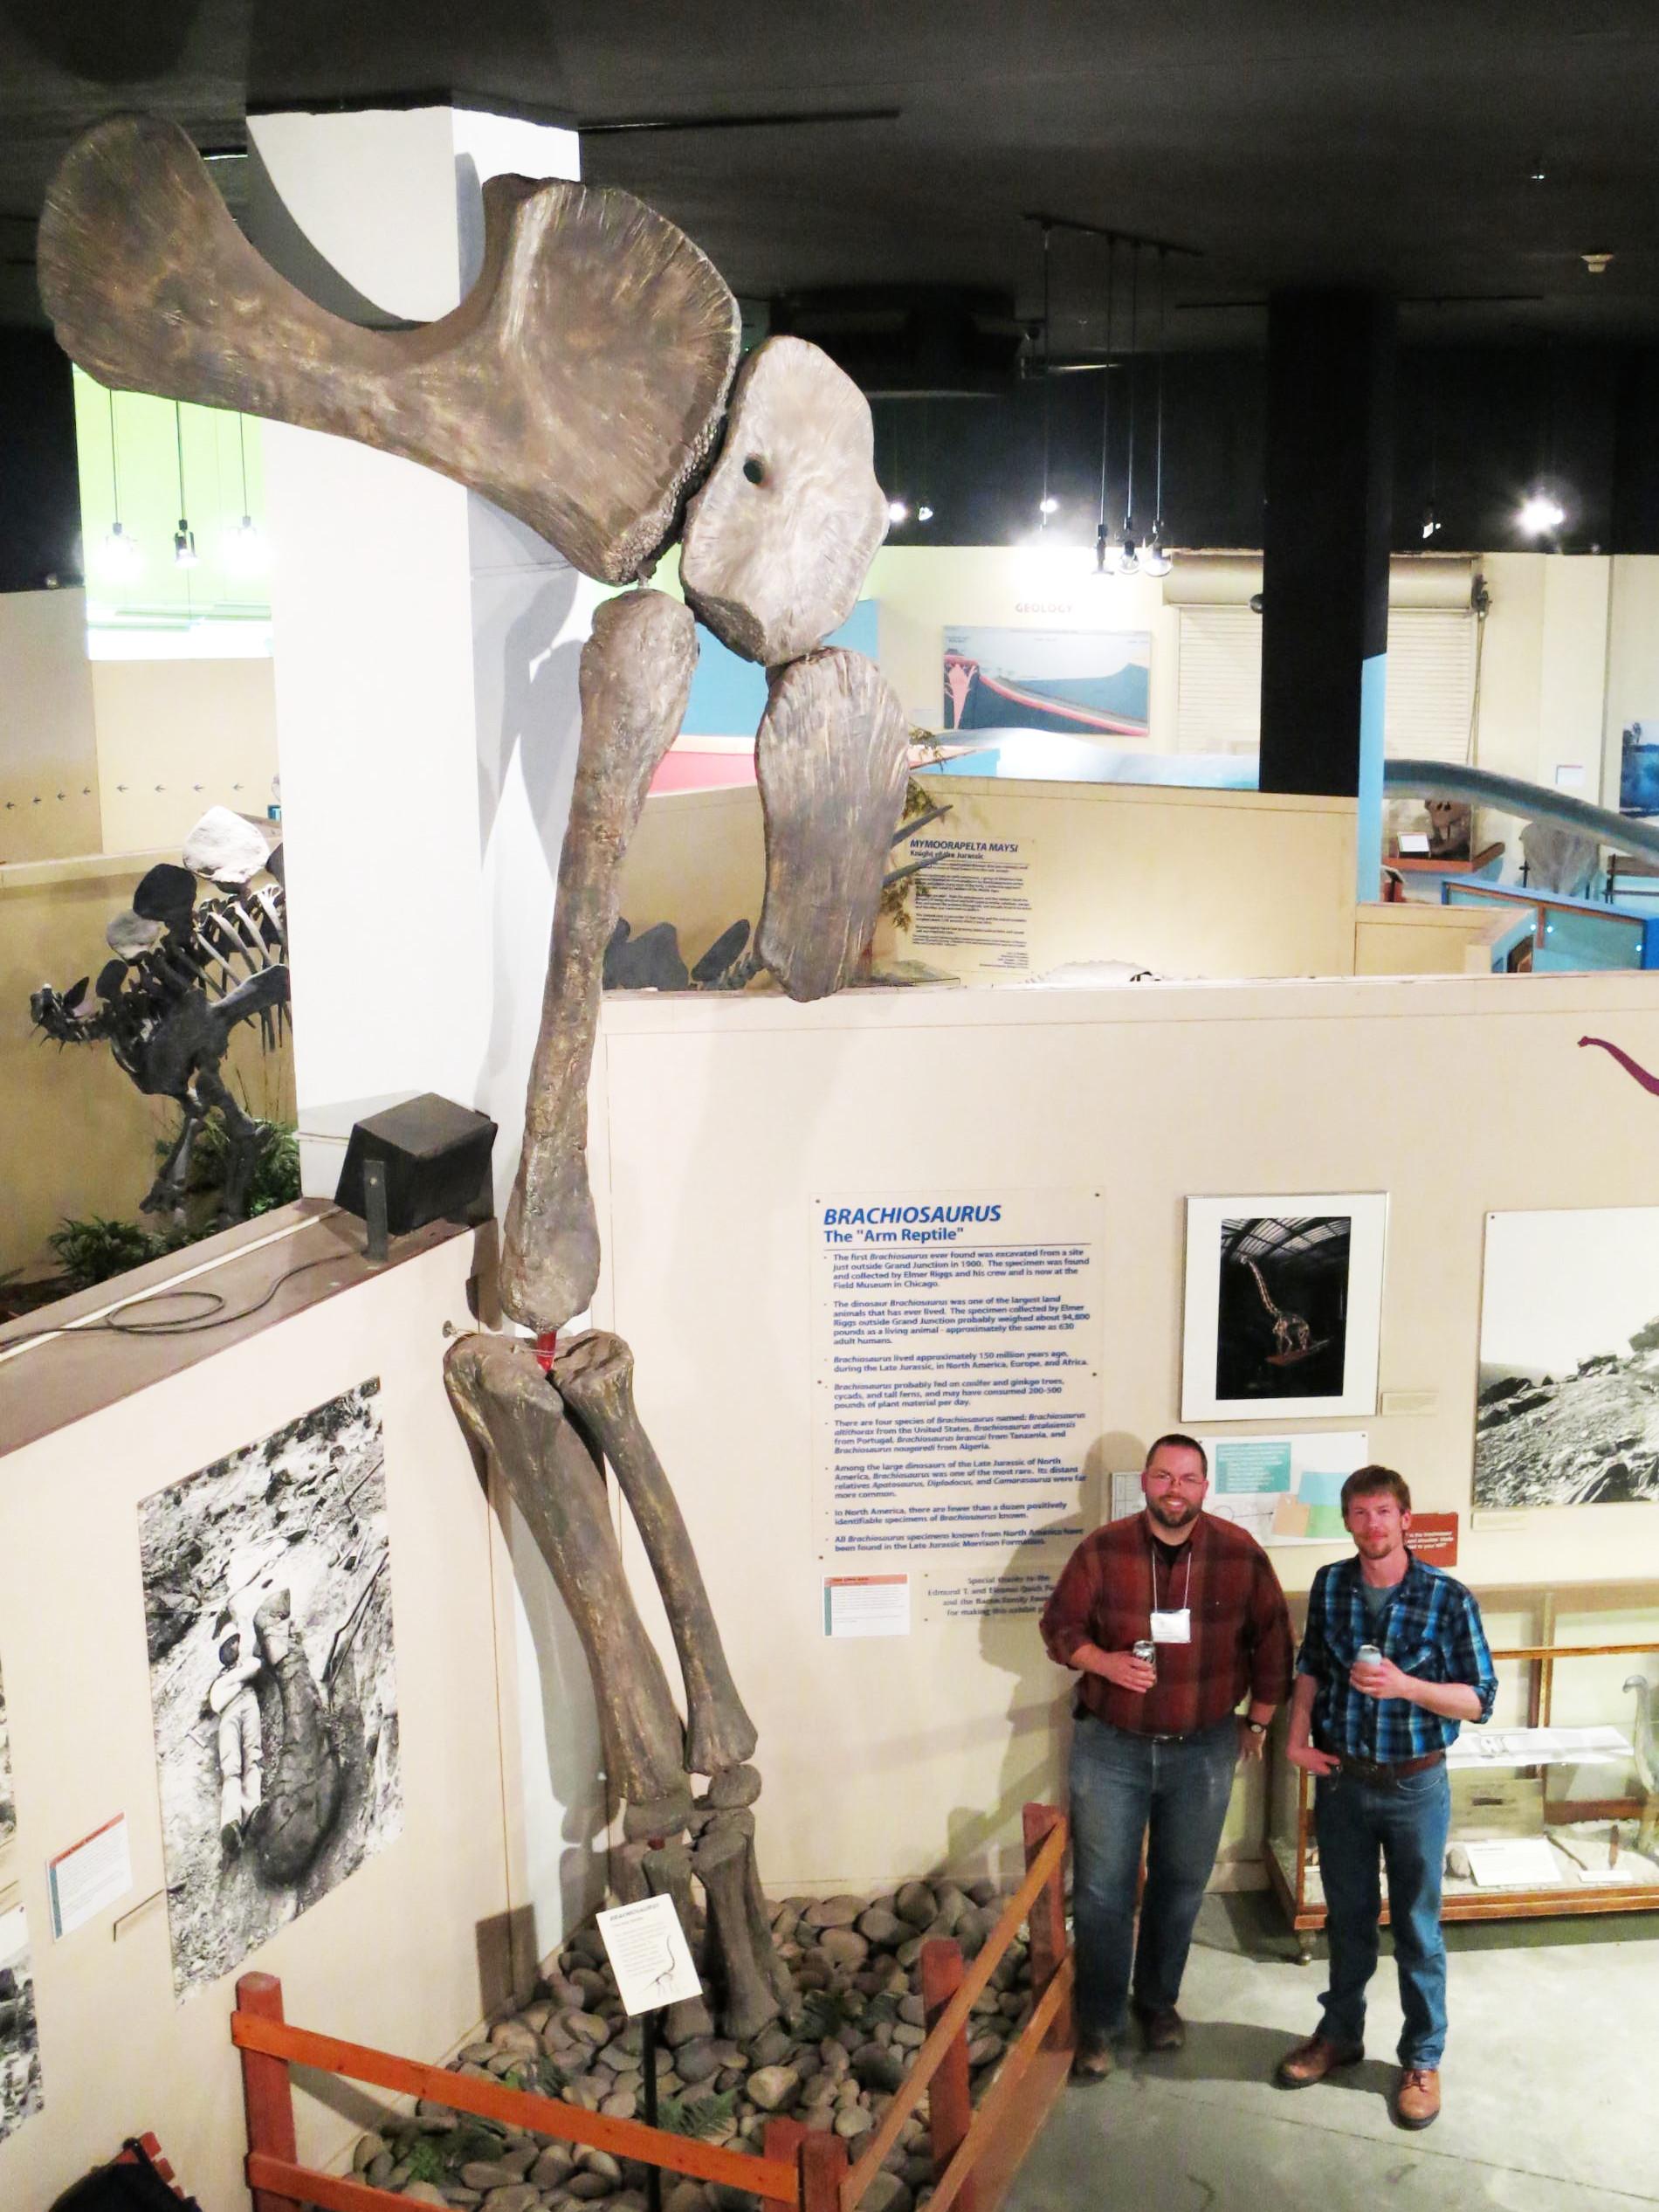 Cary and Matt with Brachiosaurus forelimb